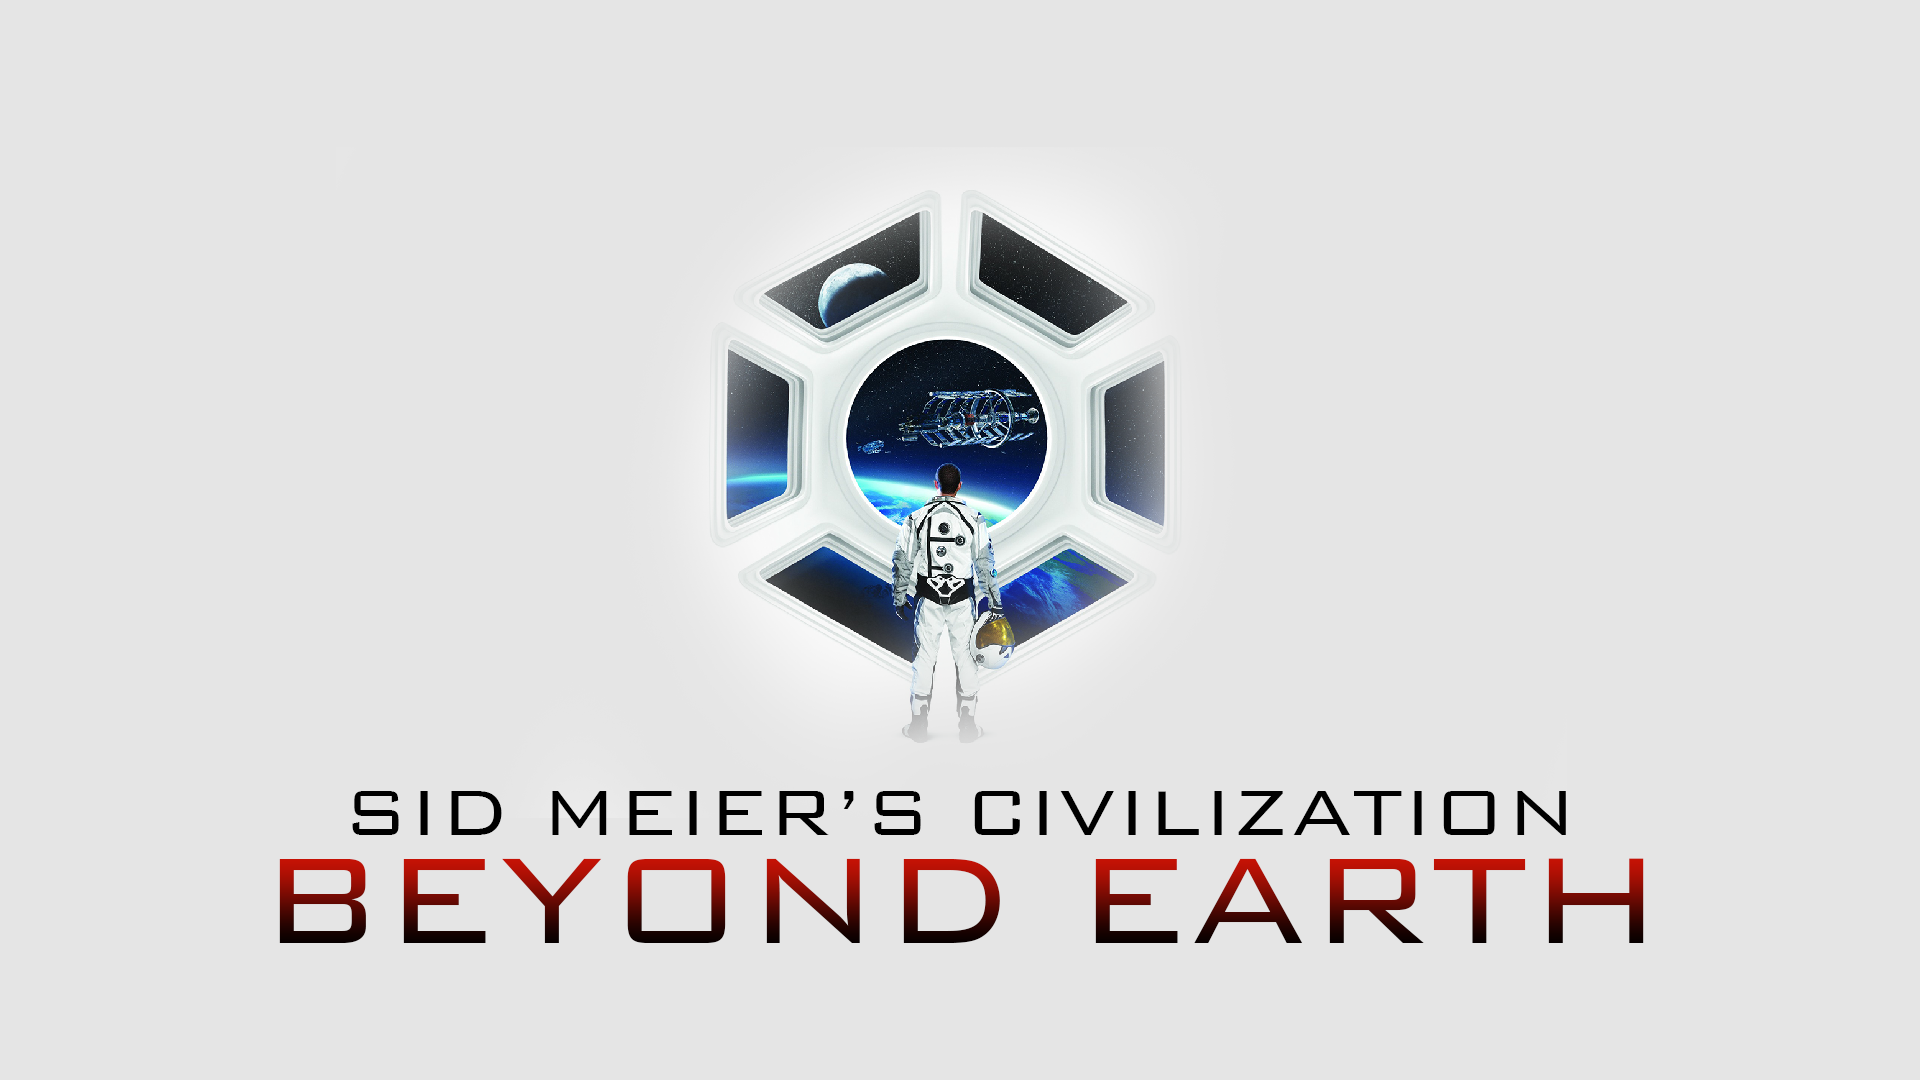 Sid Meier's Civilization Beyond Earth: Terra Incognita